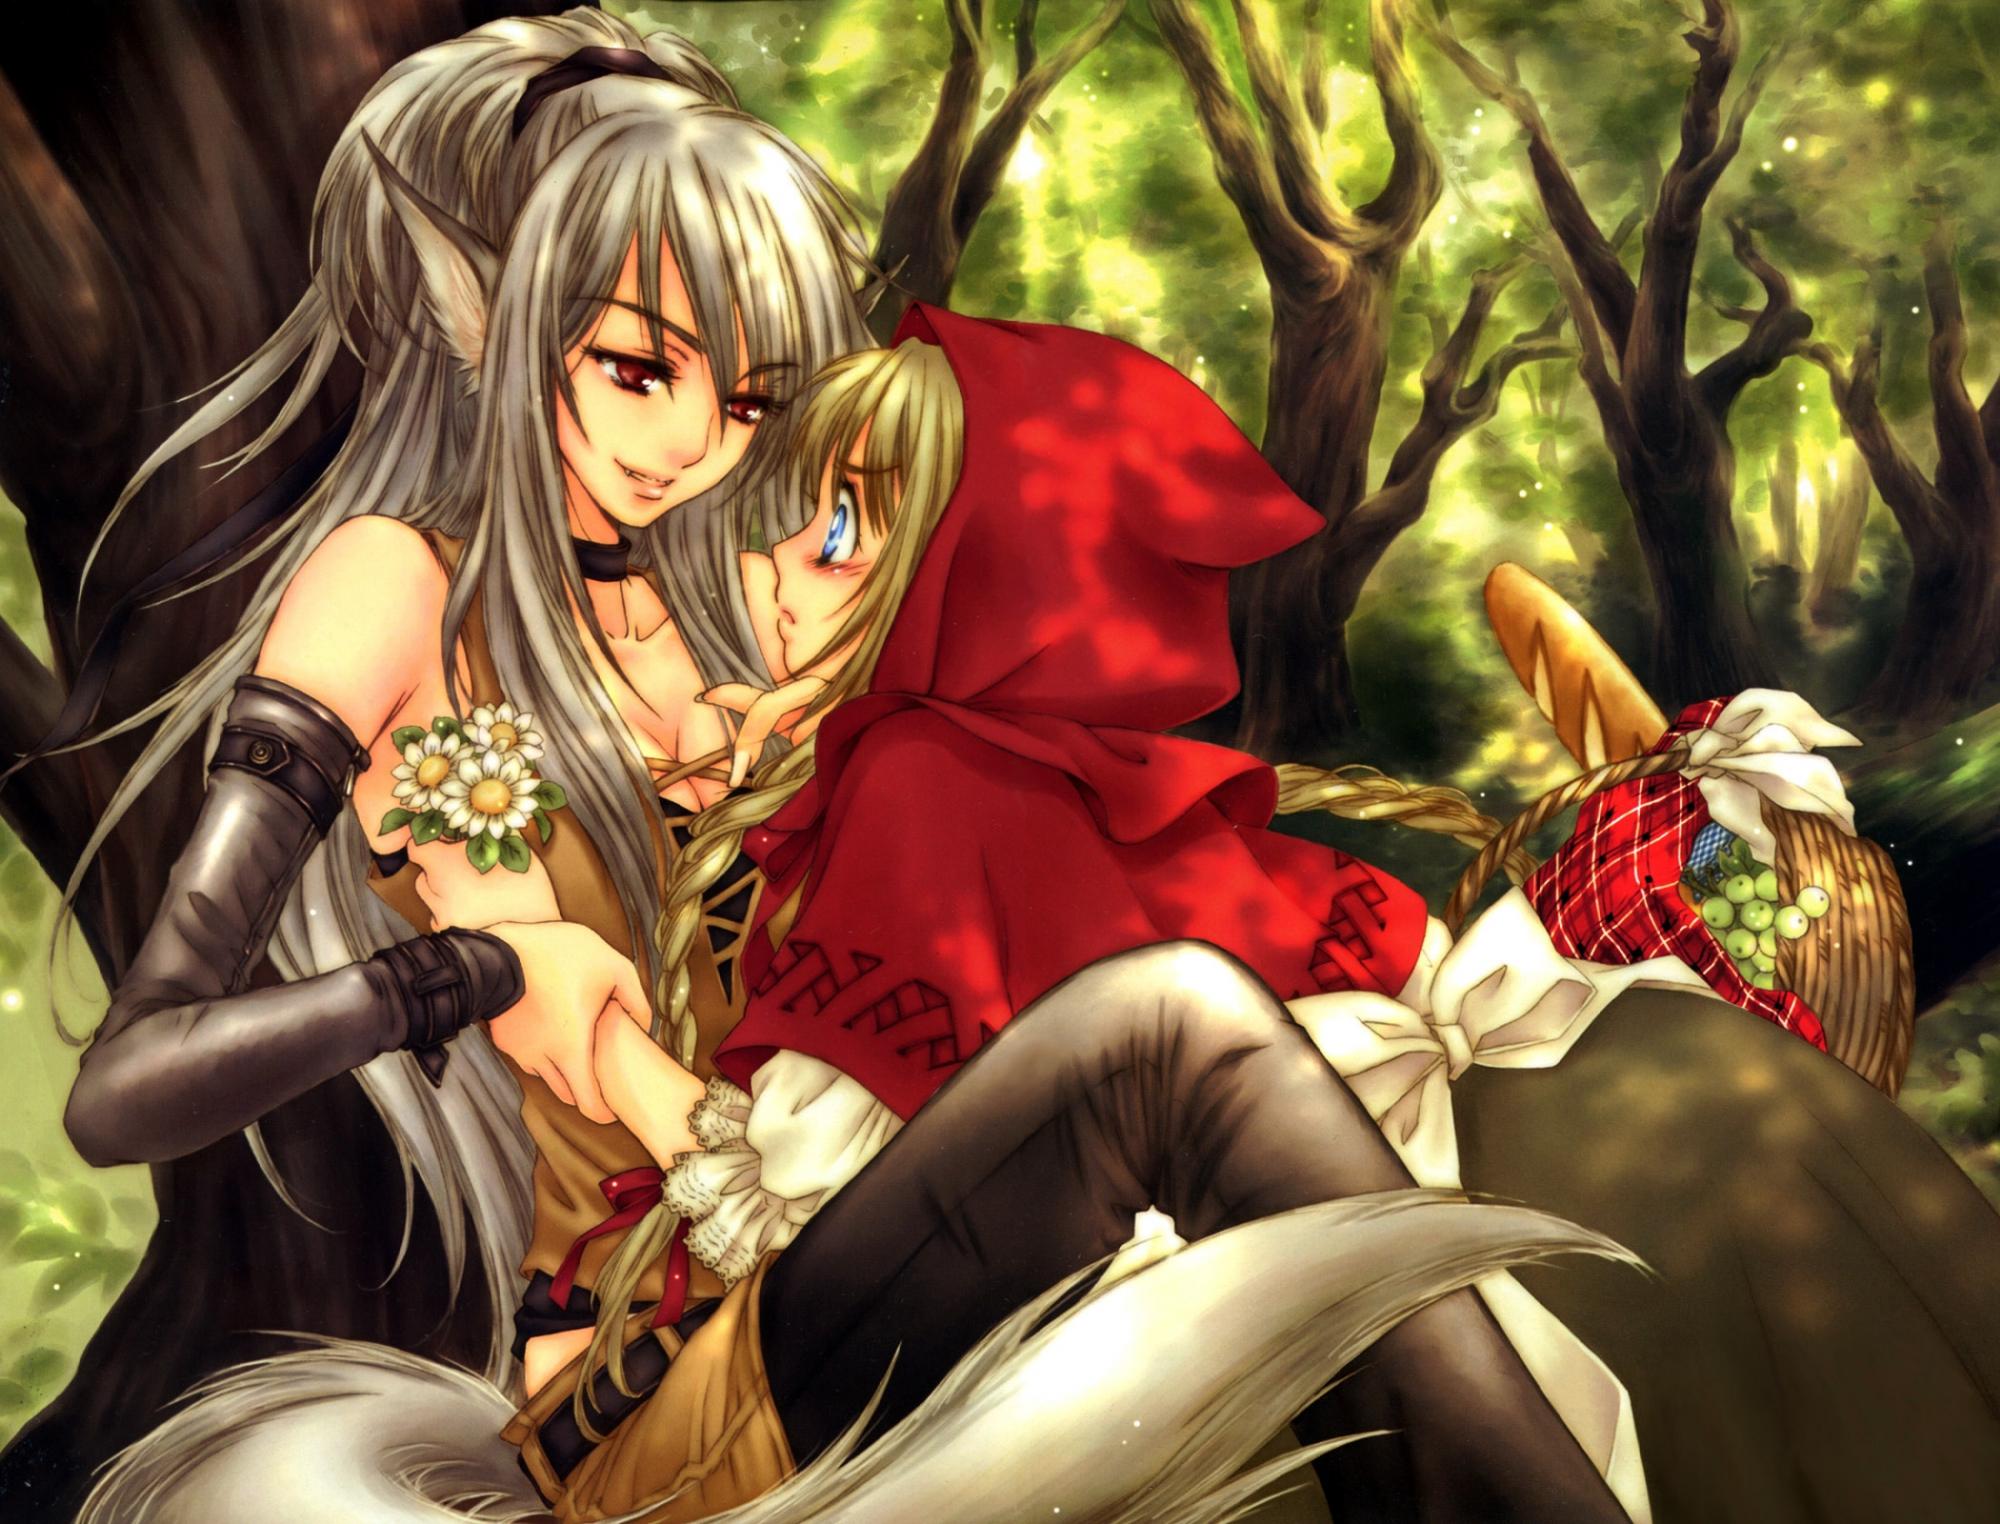 2girls animal_ears anthropomorphism big_bad_wolf flowers food little_red_riding_hood red_eyes red_riding_hood sakura_shio shoujo_ai tail wolfgirl